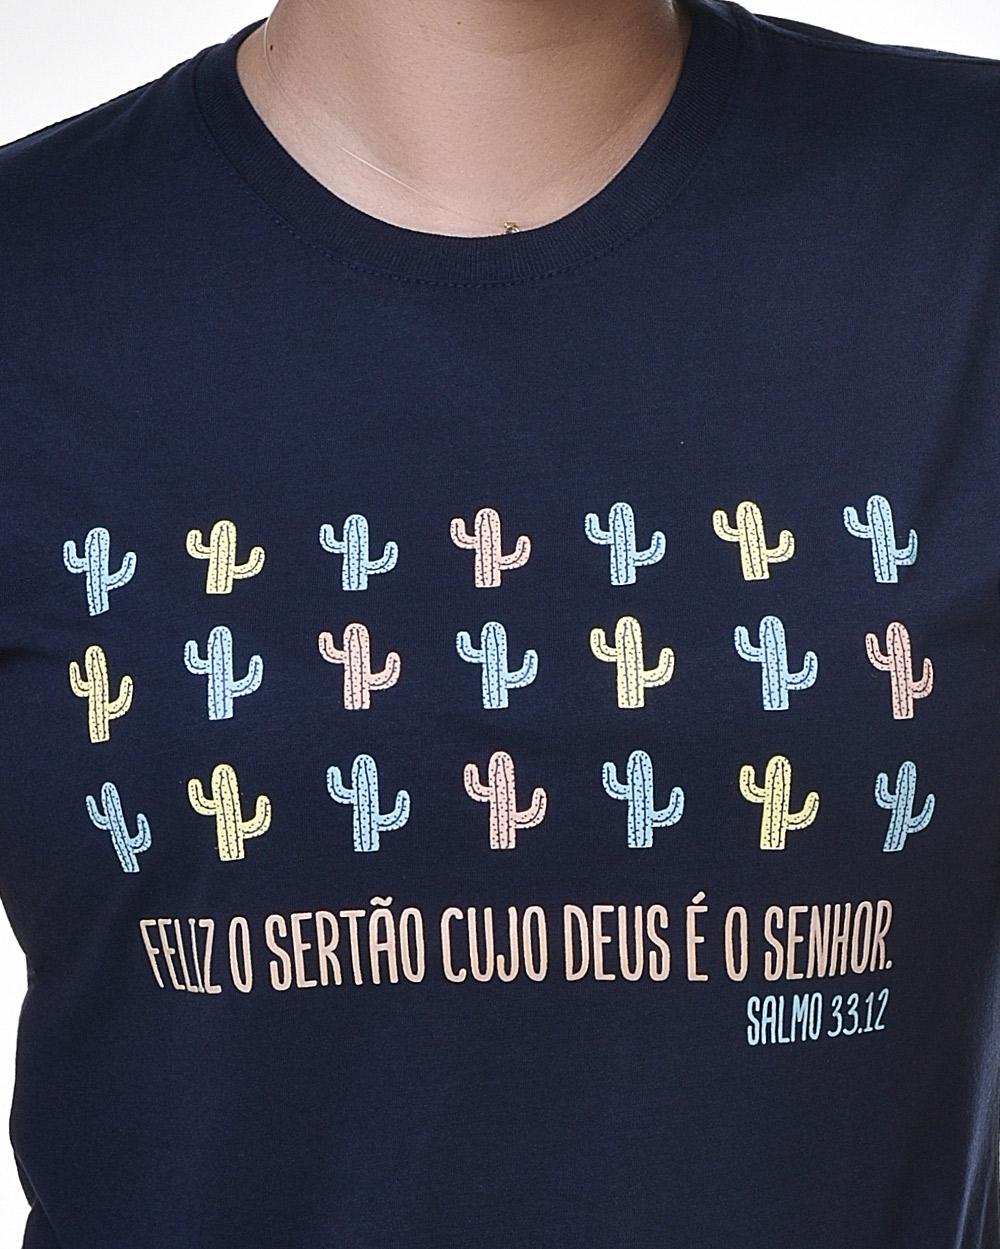 Camiseta Baby Look - Bendito Sertão 01